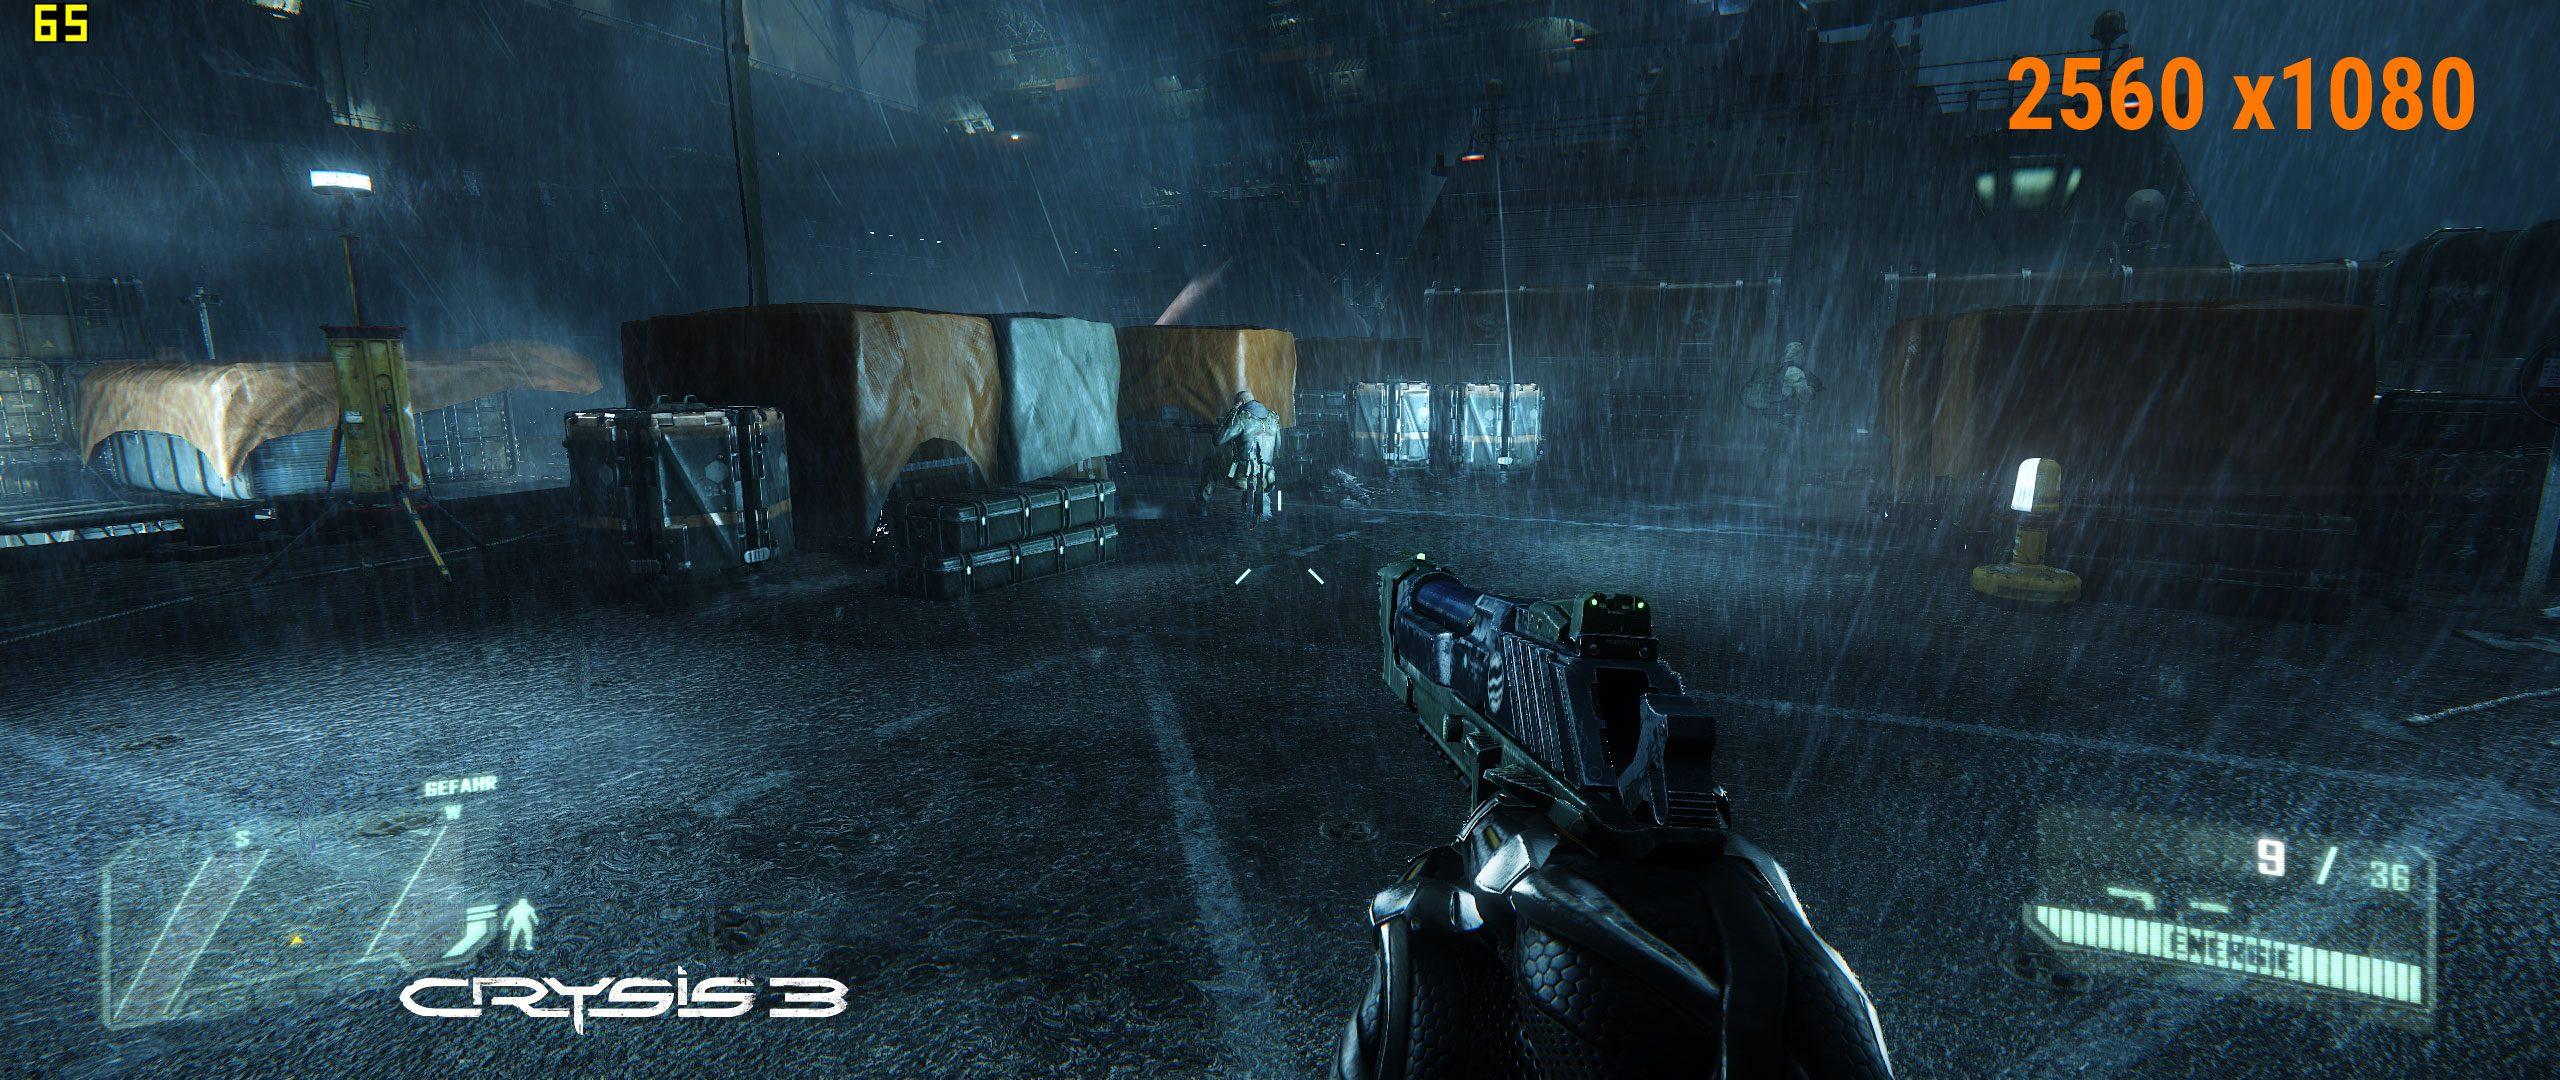 Asus-ROG-Zephyrus-GX501VI-GZ020T_Games-Monitor-5